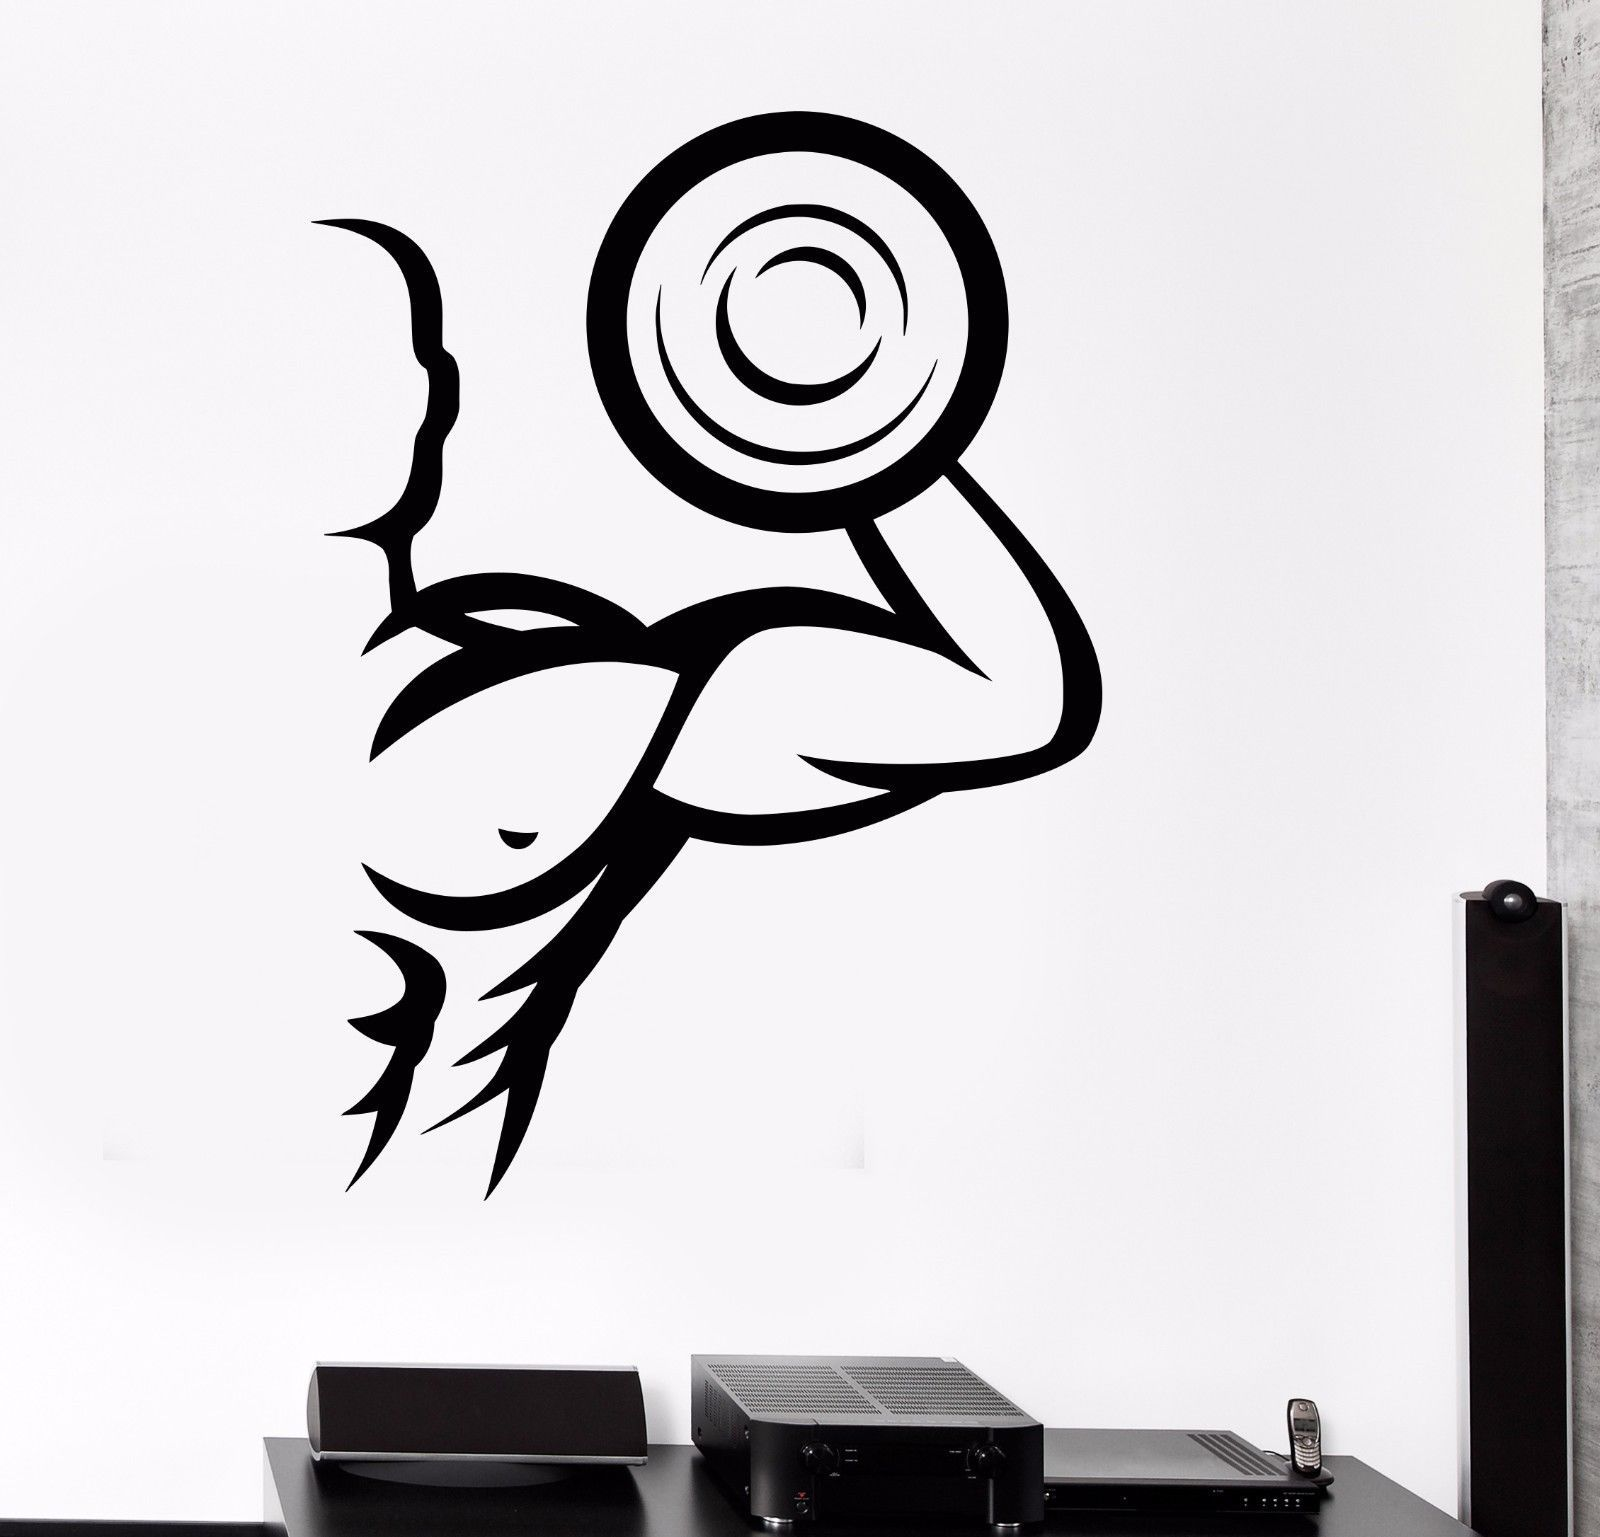 Gym Decal Wall Sticker Power Body Fit Bodybuilder Fitness Training Silhouette